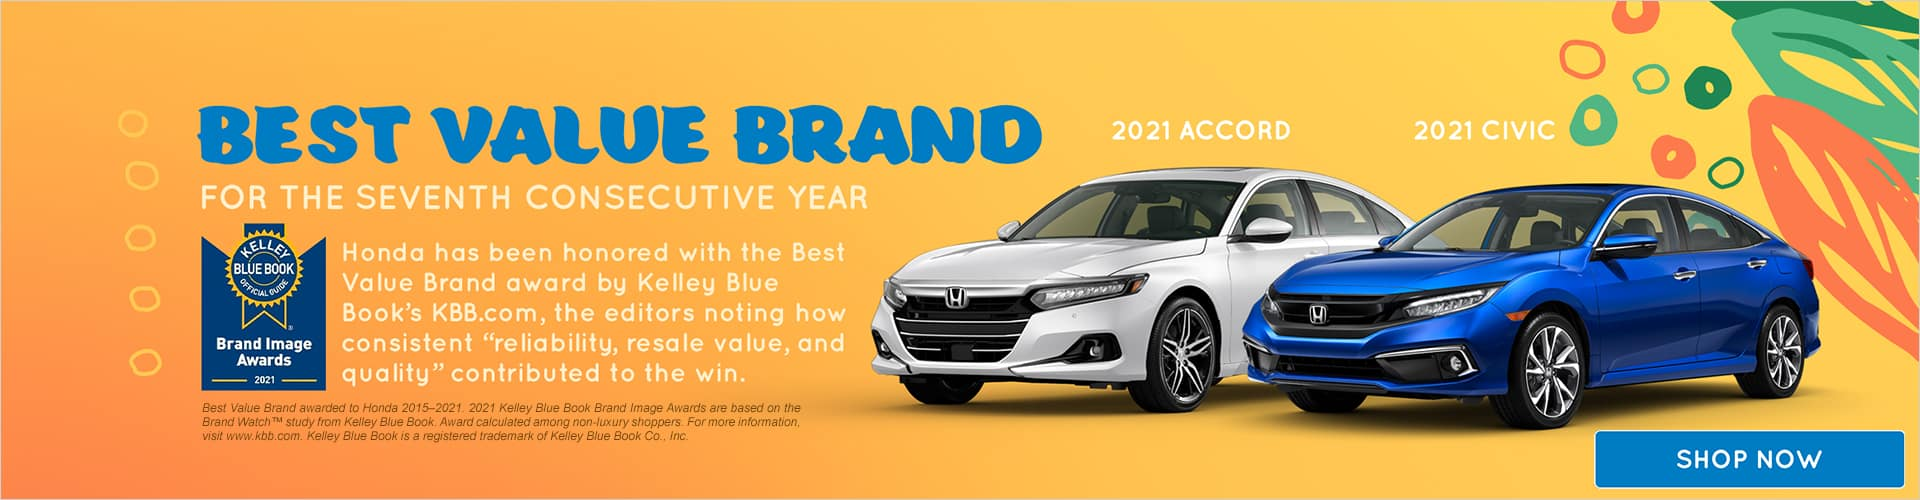 Get a new Honda! Best Value Brand